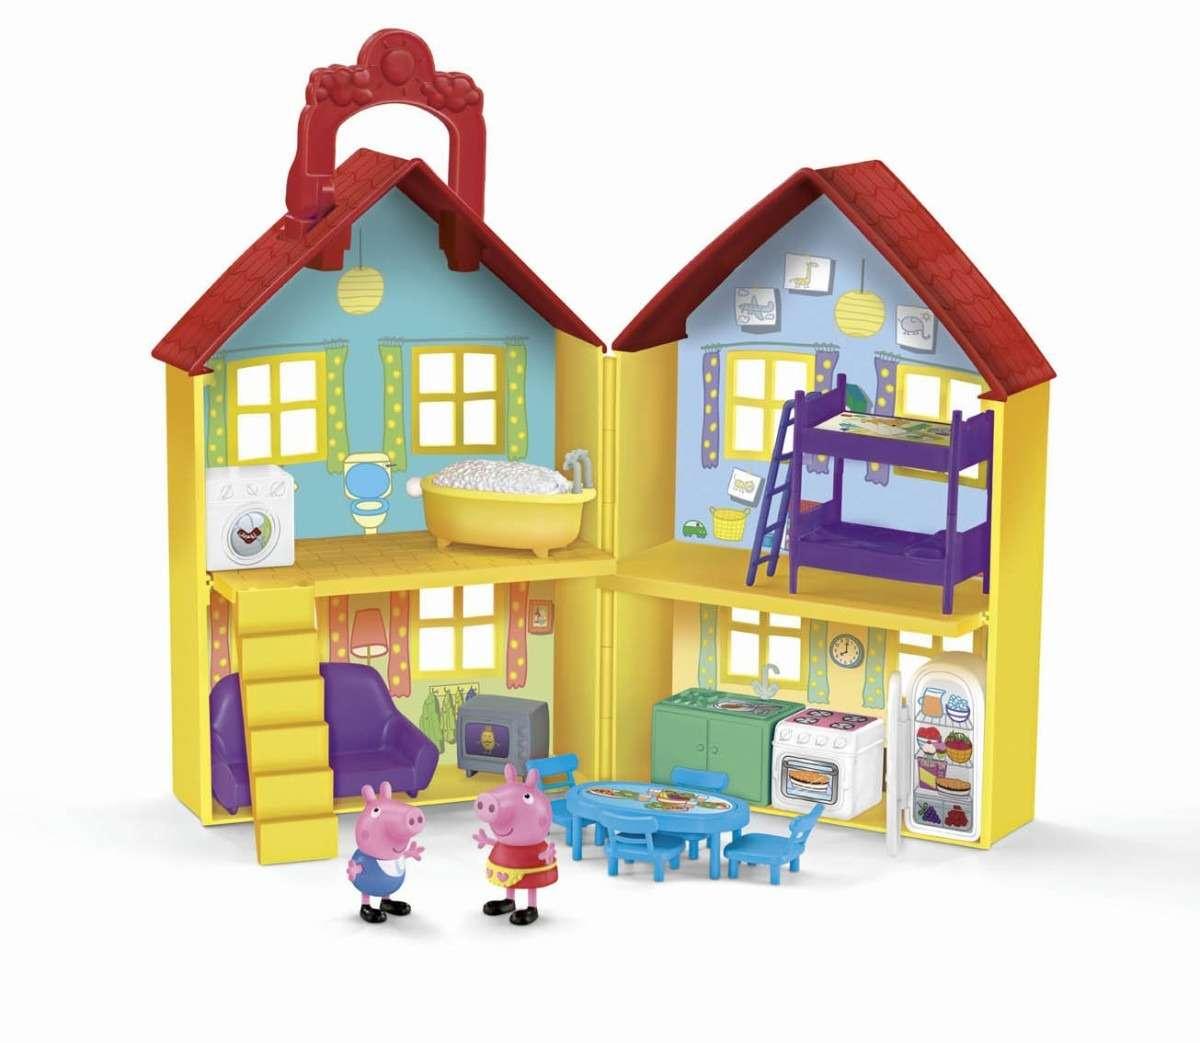 peppa pig casita de juegos casa de sorpresa set pmo. Black Bedroom Furniture Sets. Home Design Ideas